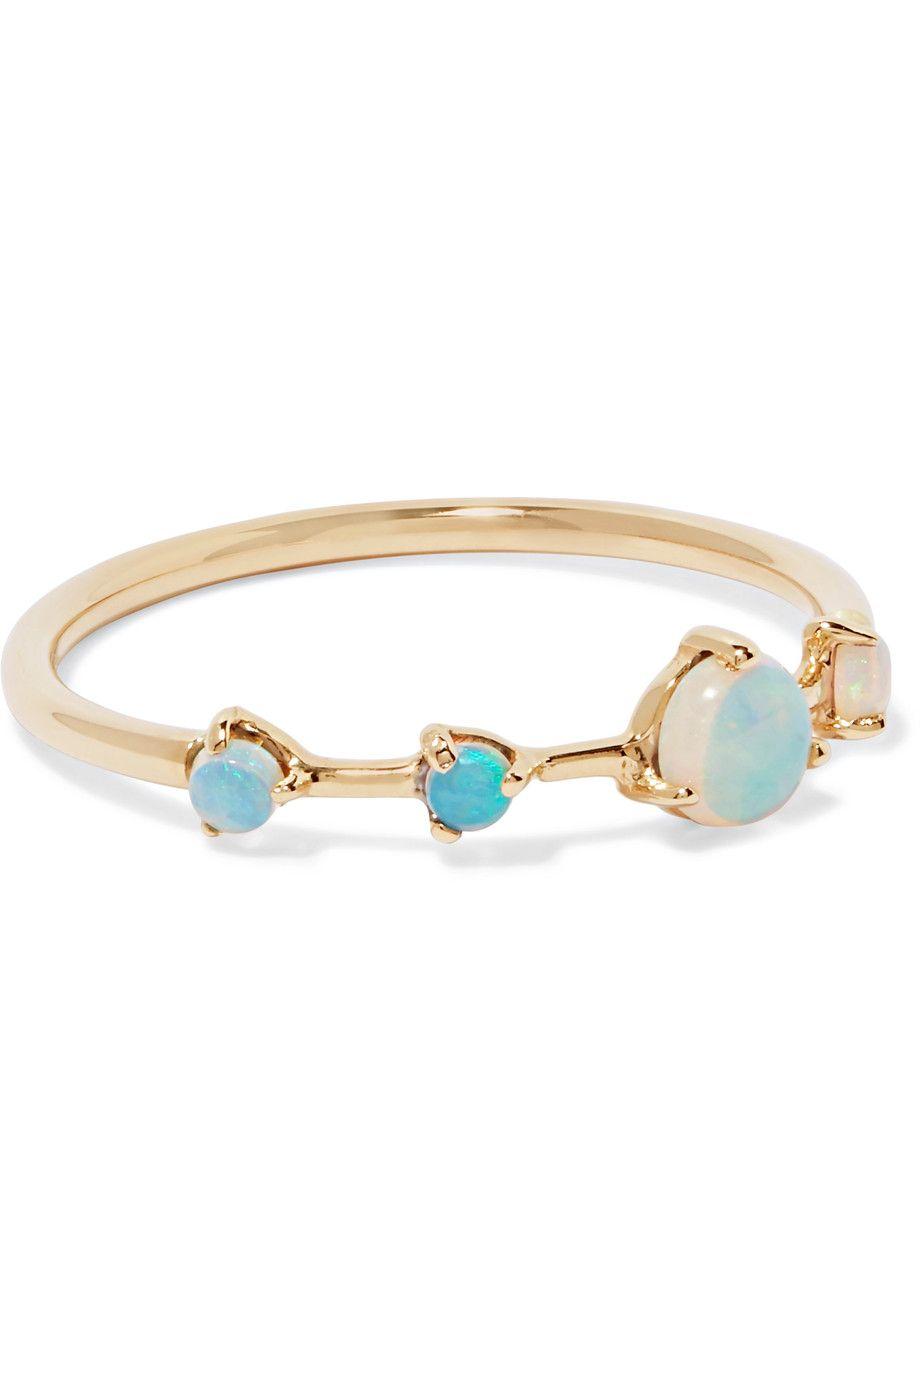 Wwake 14-karat Gold, Opal And Diamond Ring